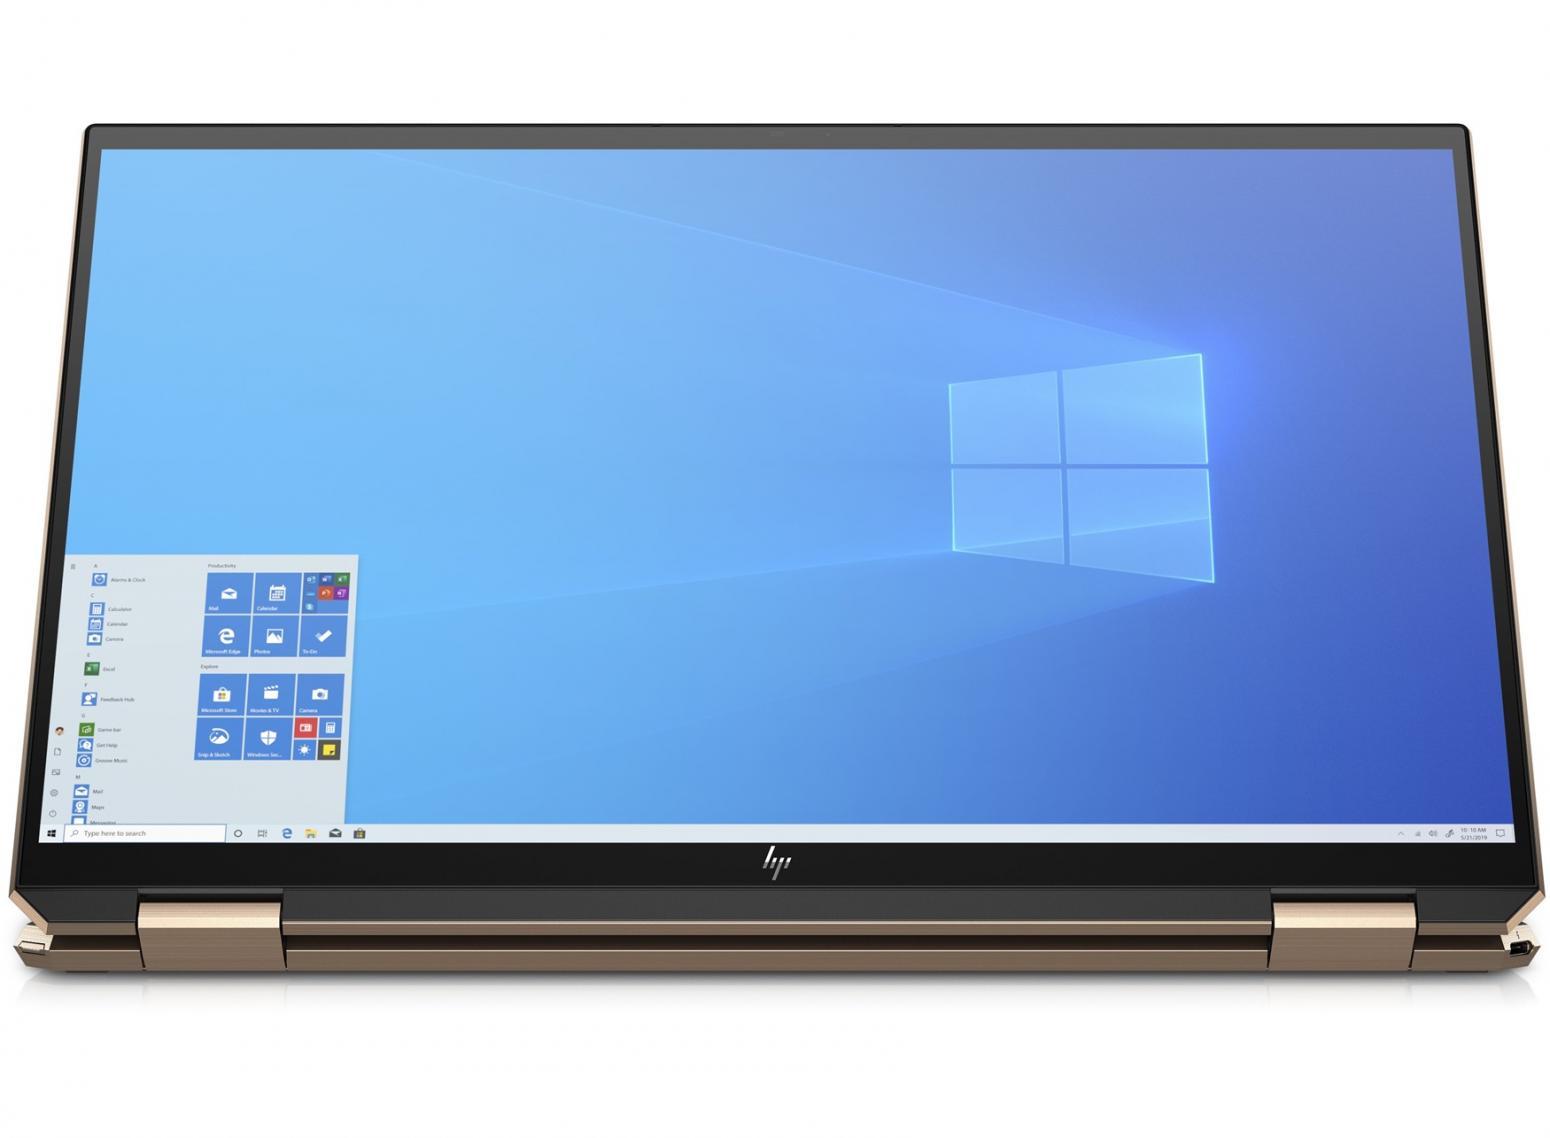 Ordinateur portable HP Spectre x360 15-eb0013nf Noir - Tactile 4K OLED, GTX 1650 Ti Max-Q - photo 2